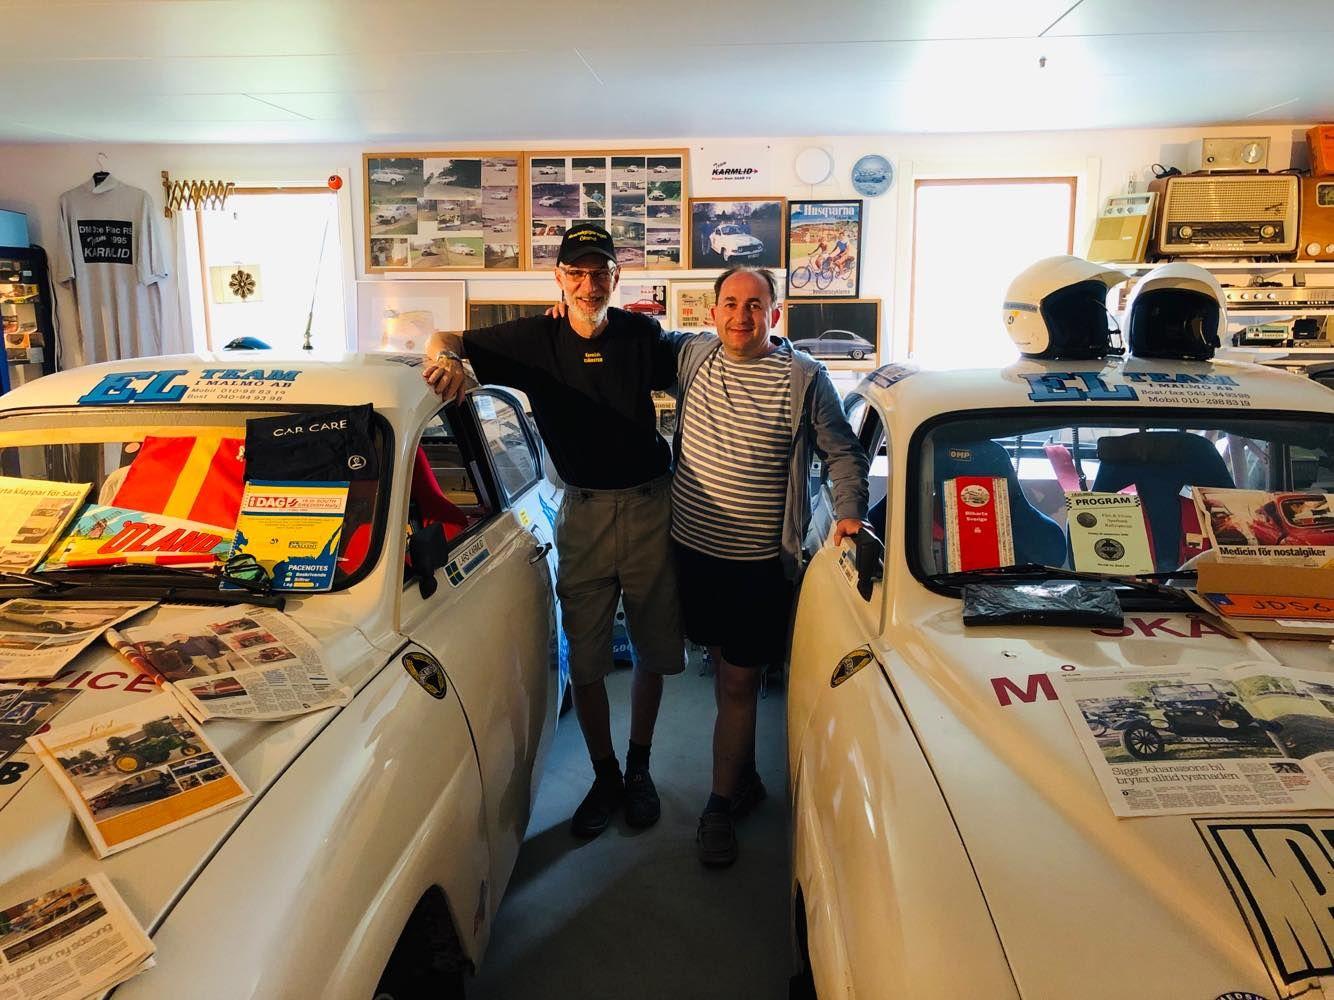 Larsova garáž na ostrove Oland